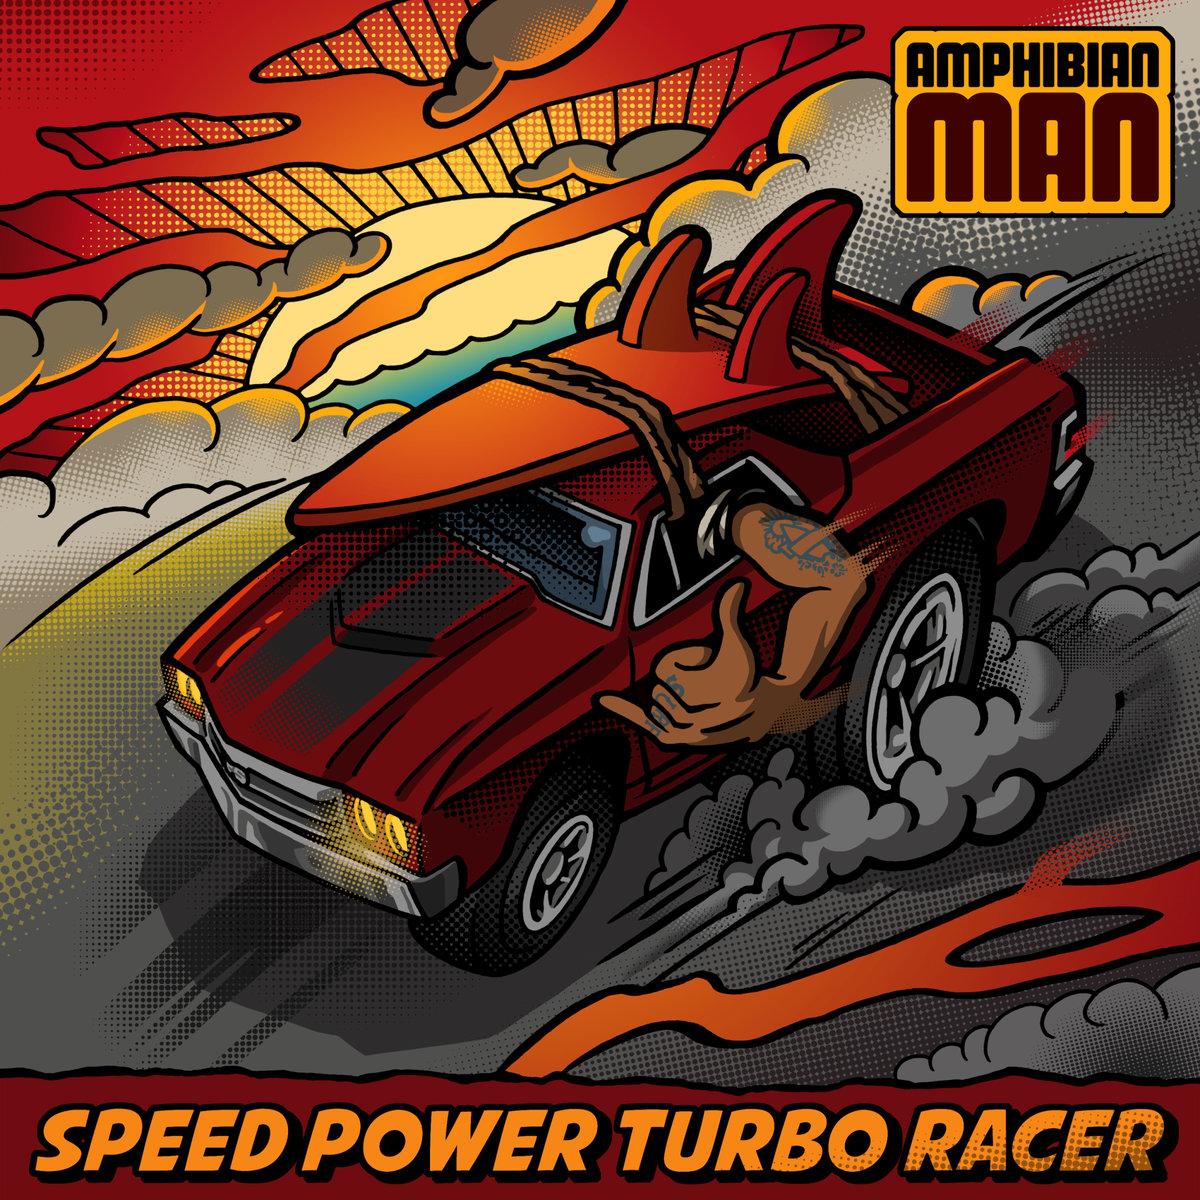 Amphibian Man - Speed Power Turbo Racer EP